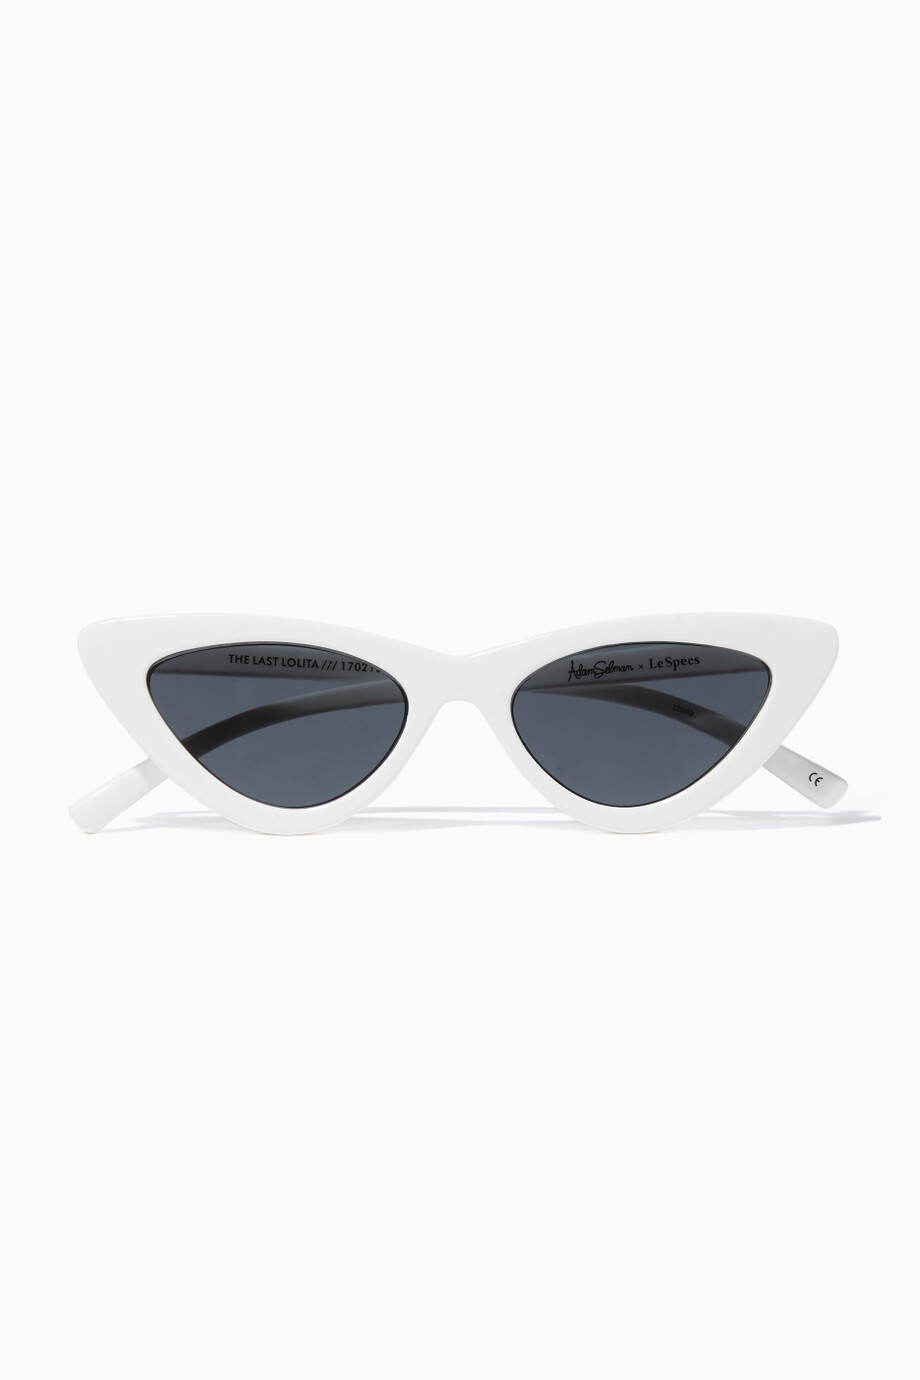 2cc34644d15 Shop Le Specs White White The Last Lolita Sunglasses for Women ...